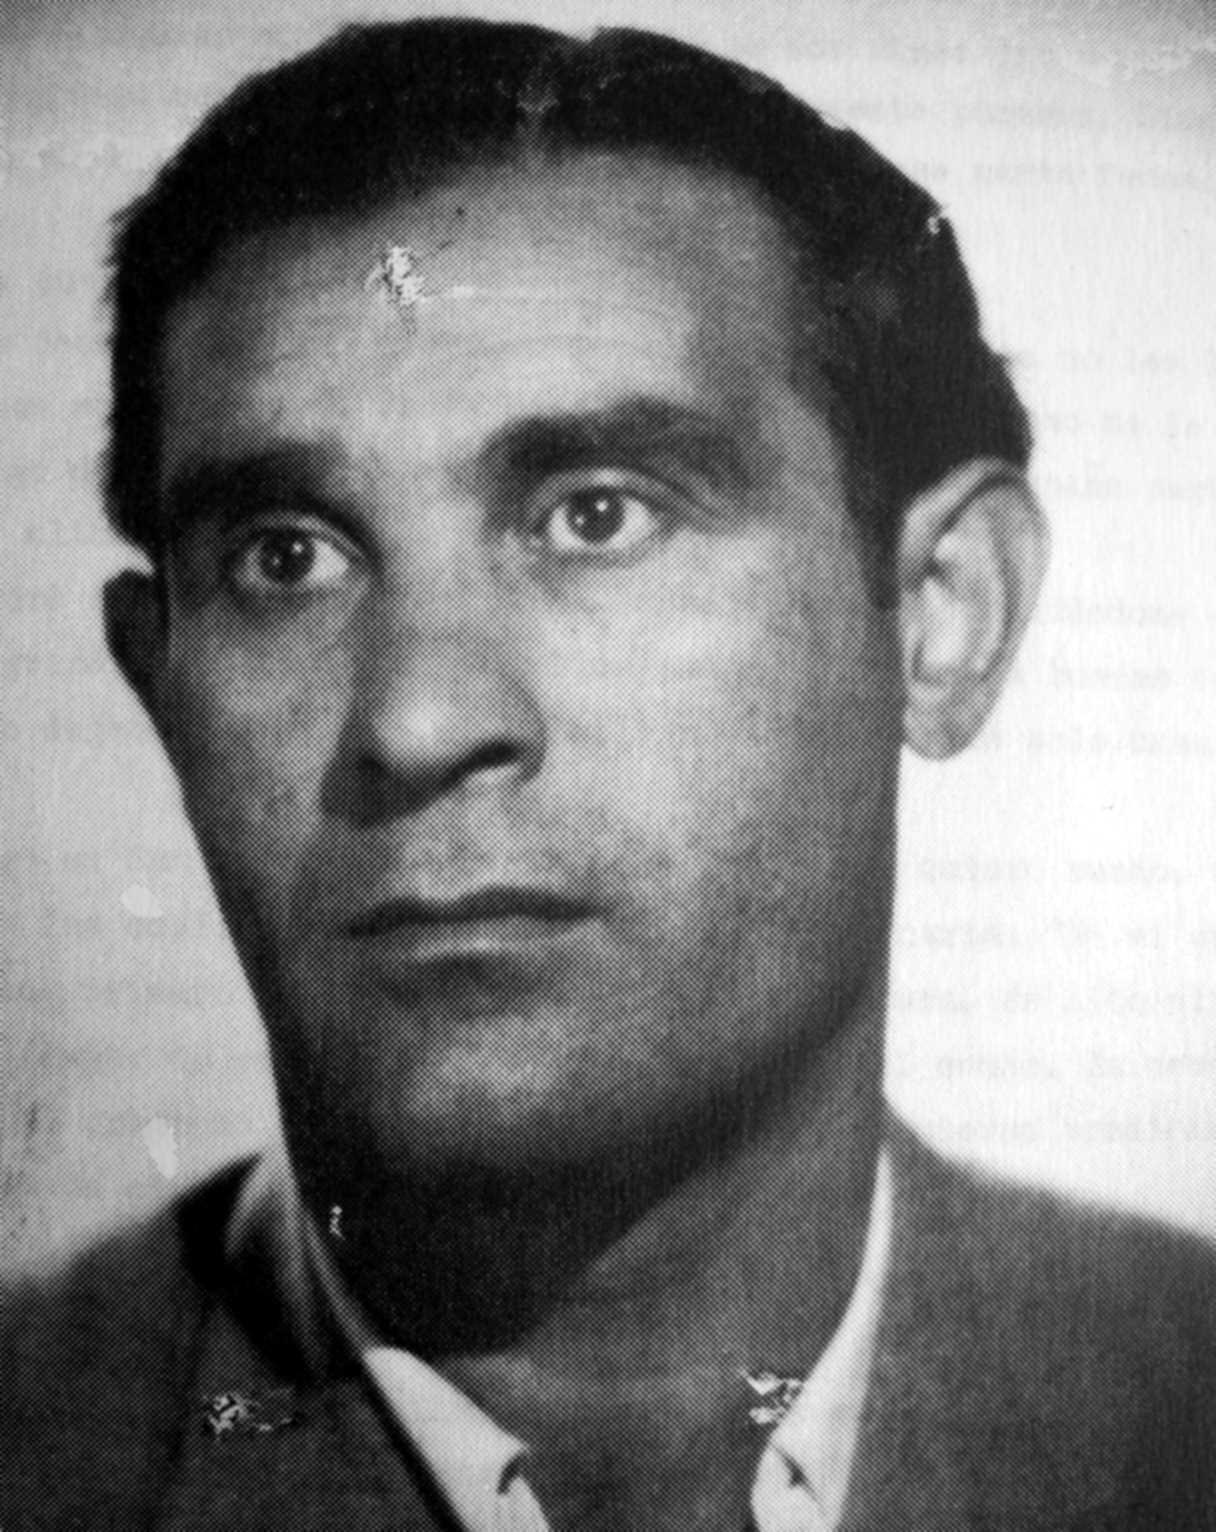 Alejandro Lameal Rodríguez